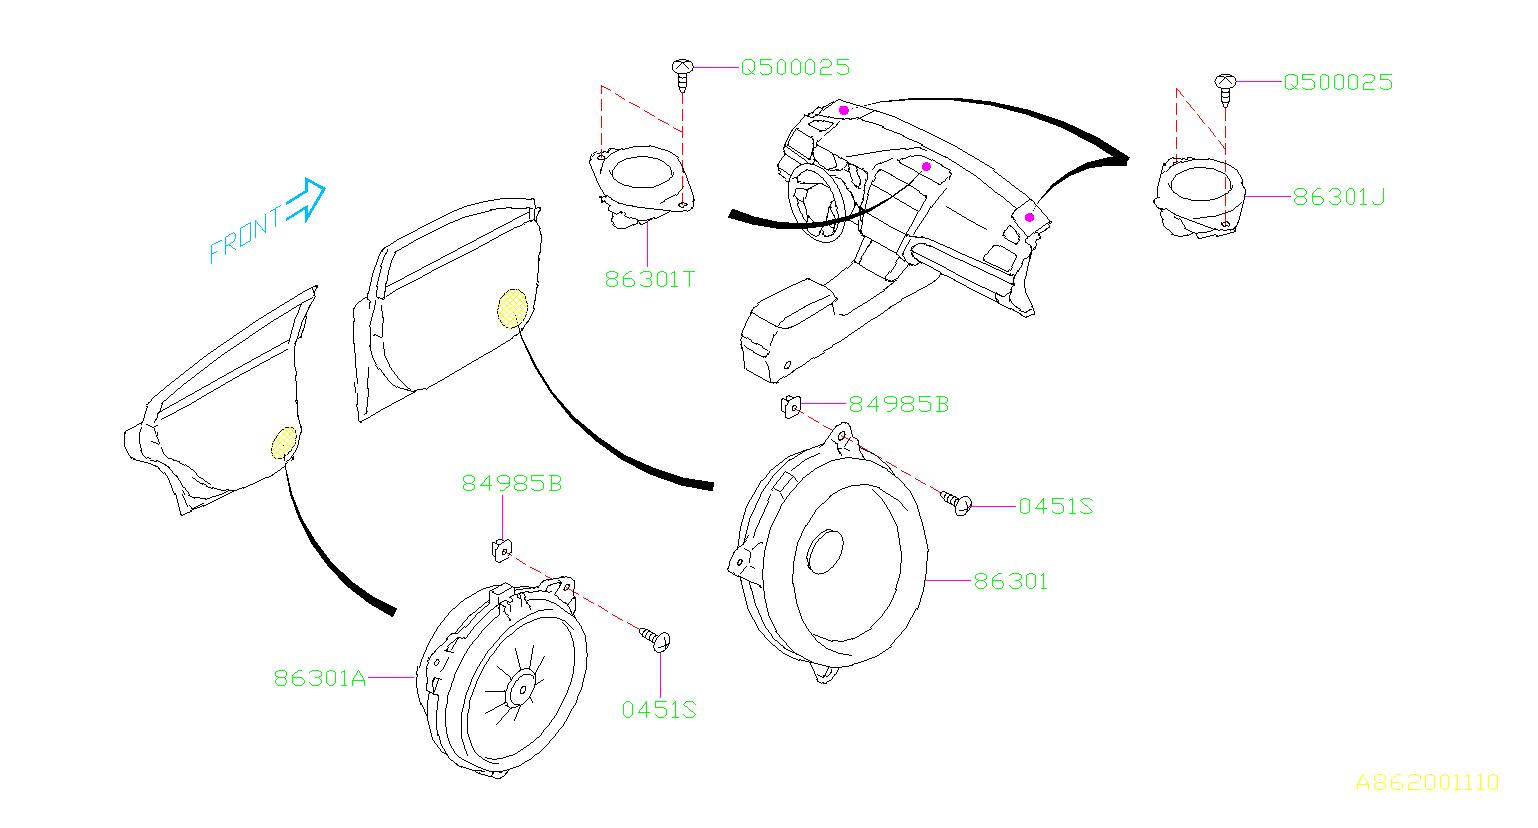 86301AL72A - Speaker - Genuine Subaru Part